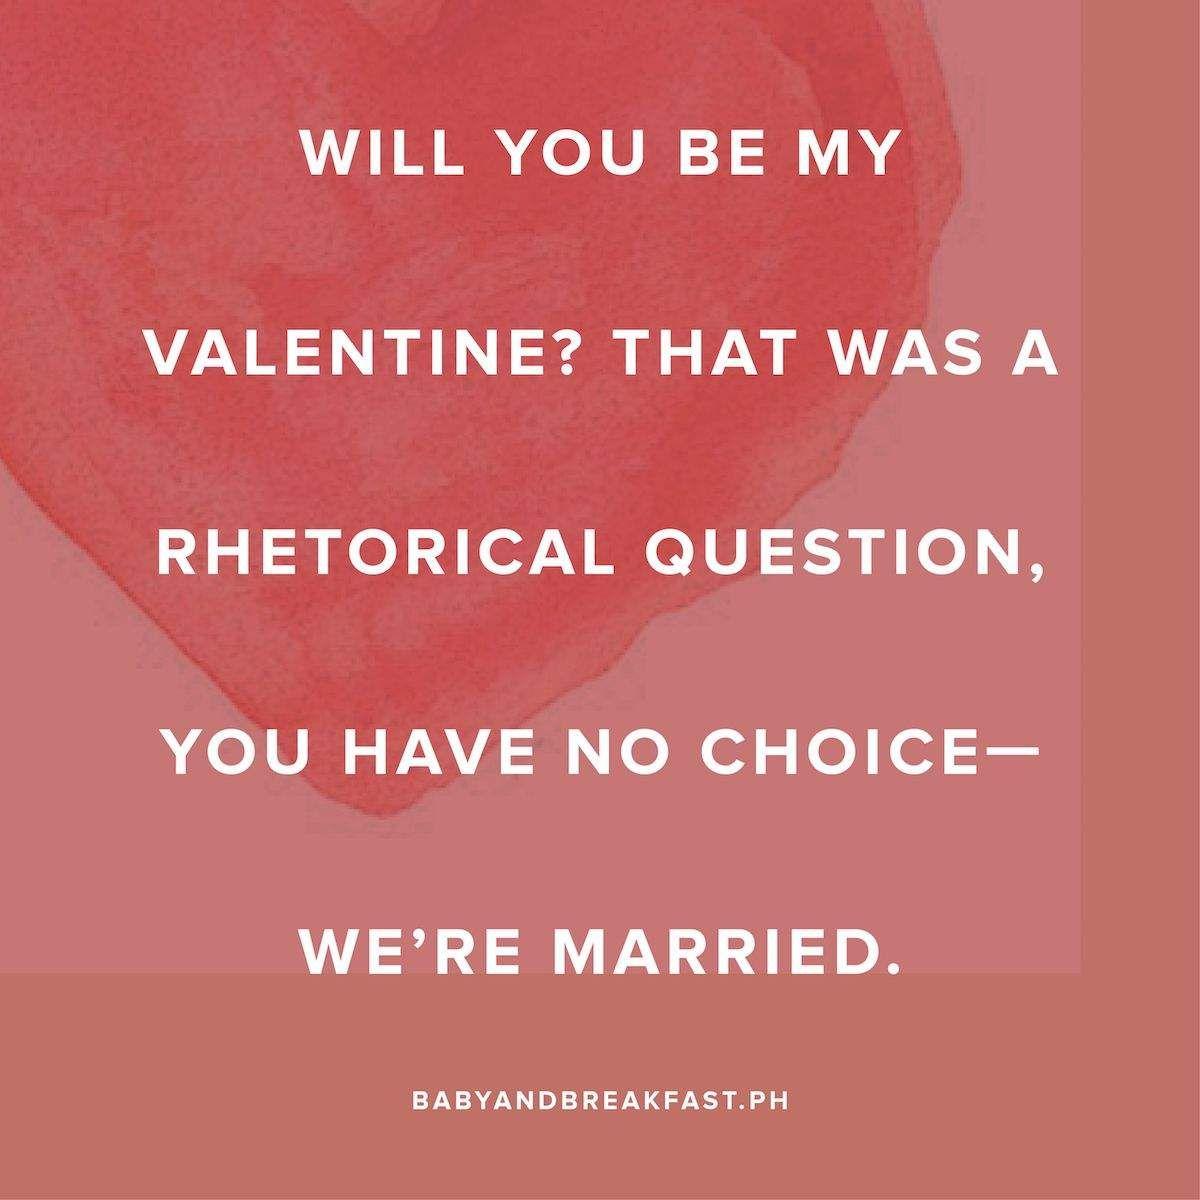 17 Top Valentines Funny Meme Template 2019 Valentines Day Funny Meme Valentines Day Memes Valentines Memes